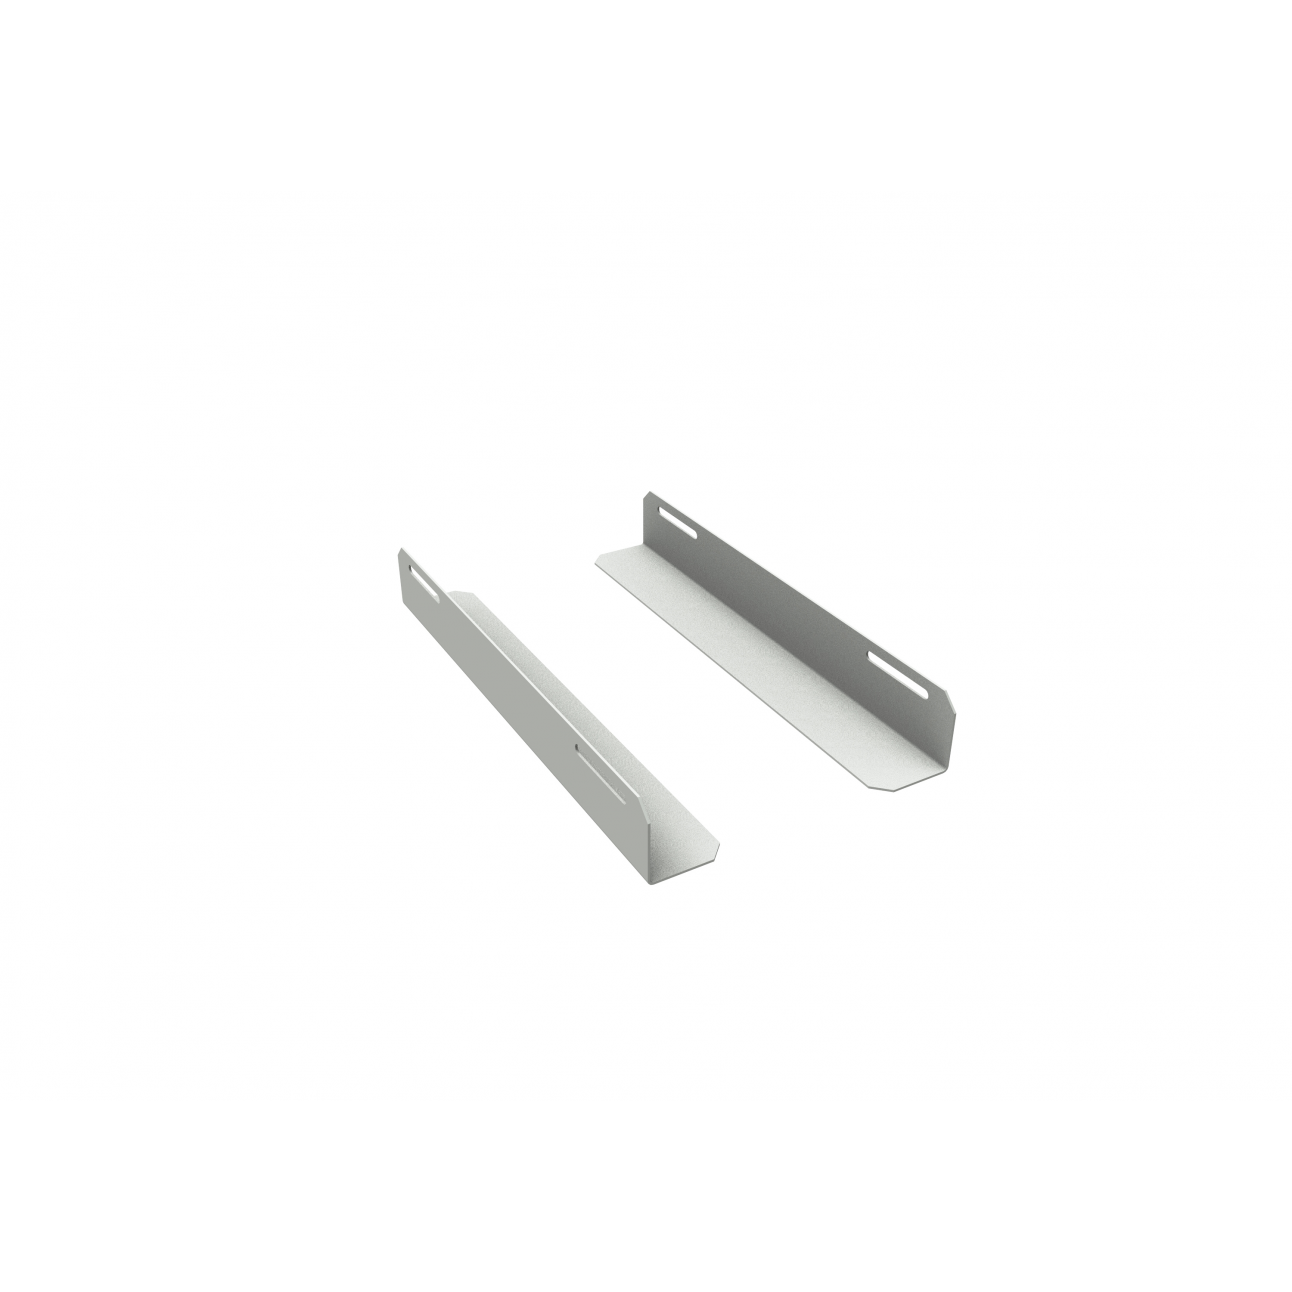 Комплект уголков опорных для шкафа глубиной 600мм (глубина уголка 400мм), распределённая нагрузка 20кг, цвет-серый (SNR-CORNER-06040-20G)